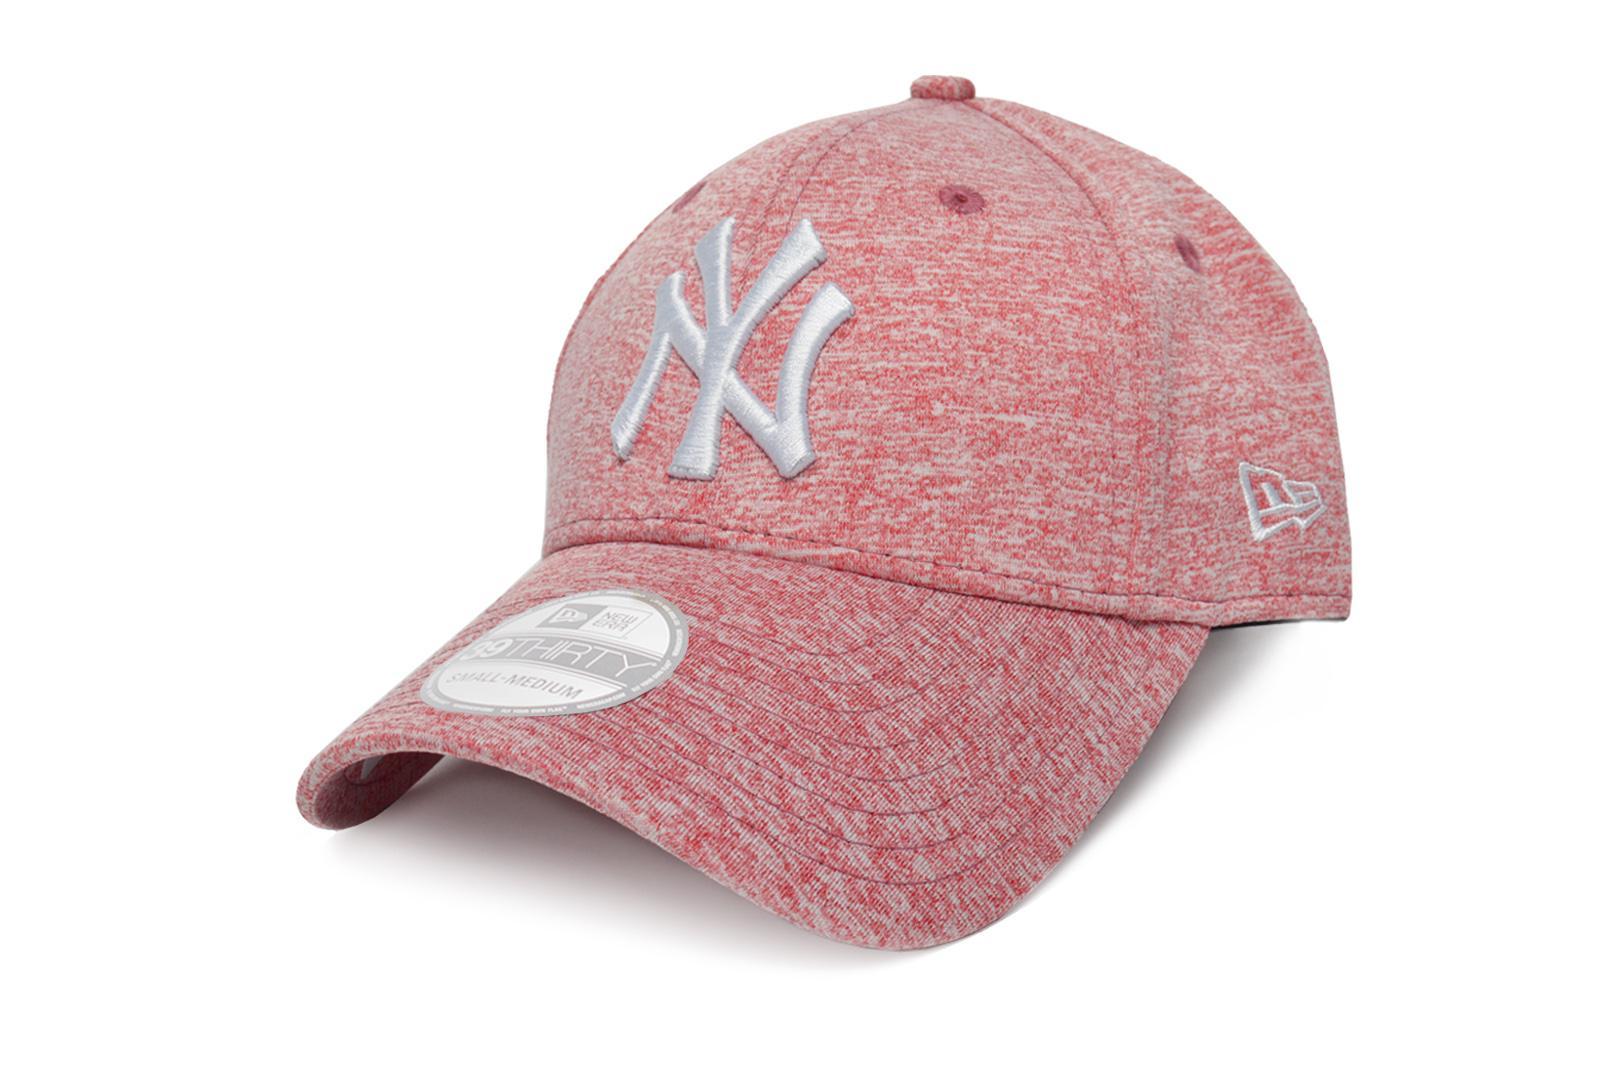 Kšiltovka NEW ERA 940 Jersey Fleck NEYYAN pink blue - Skateshop 24a22b6c91